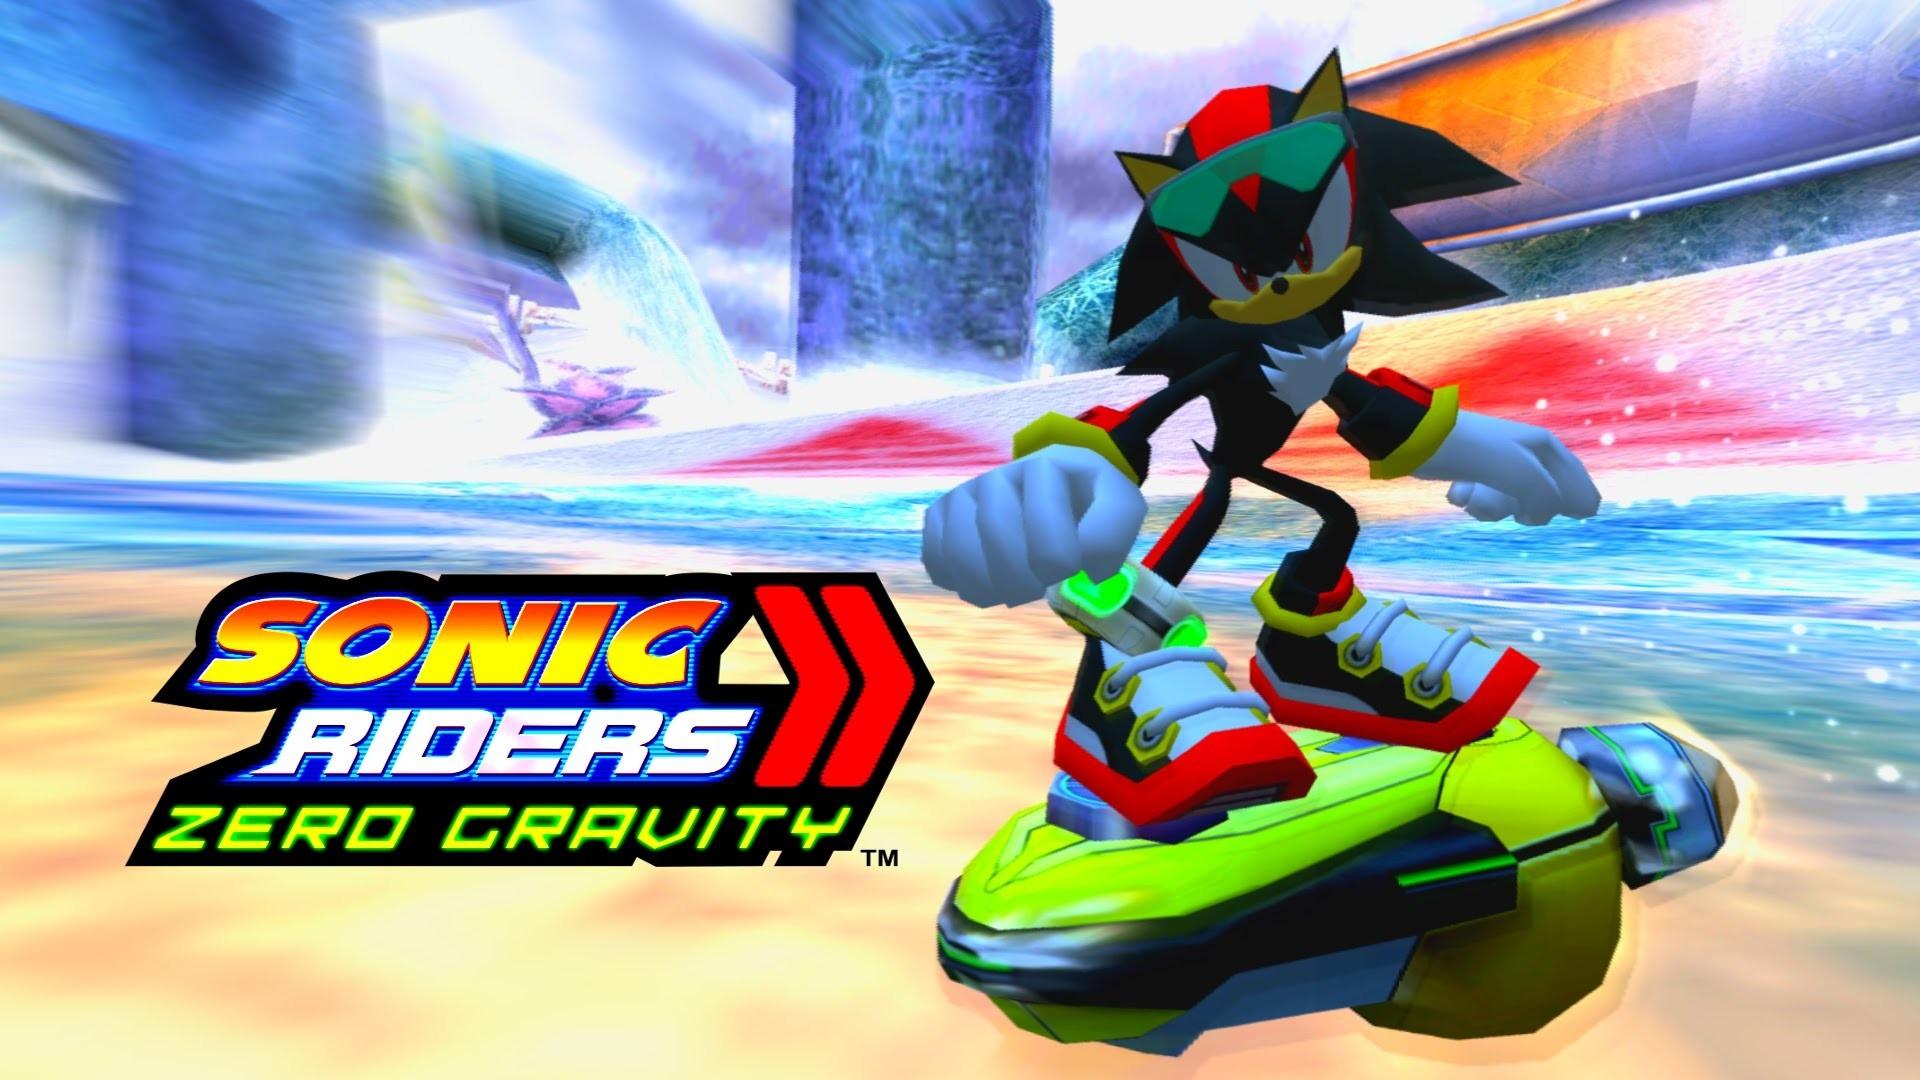 Sonic Riders Zero Gravity – Snowy Kingdom – Shadow 1080p 60 FPS – YouTube